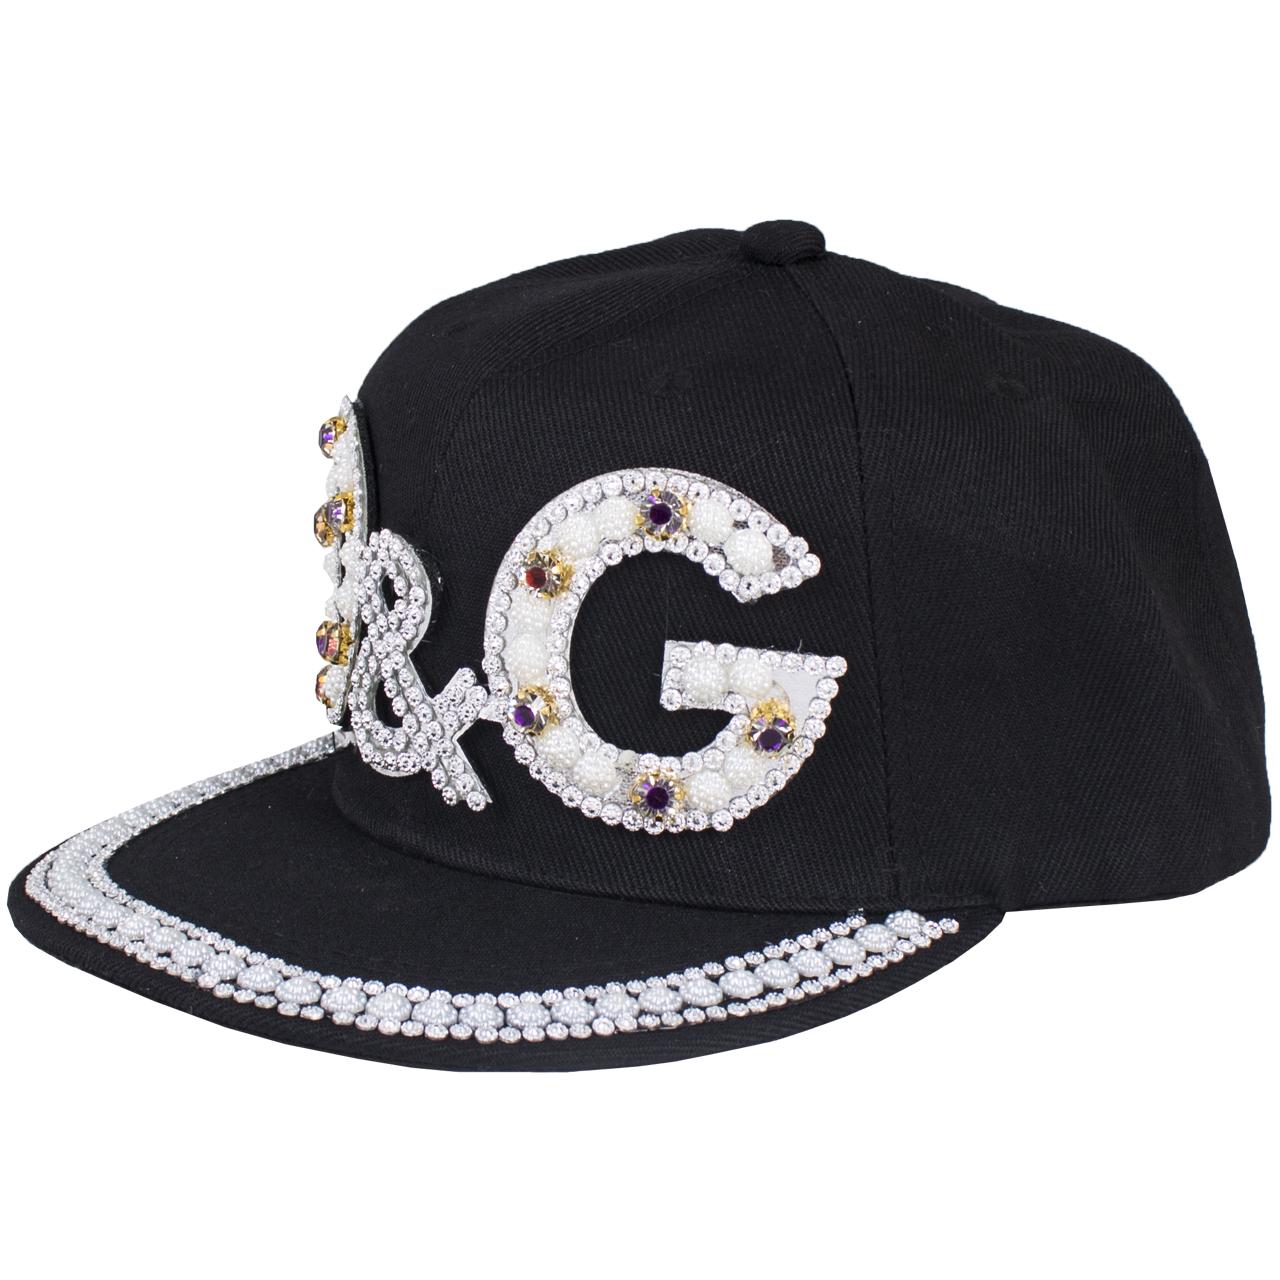 کلاه کپ زنانه کد SH-480